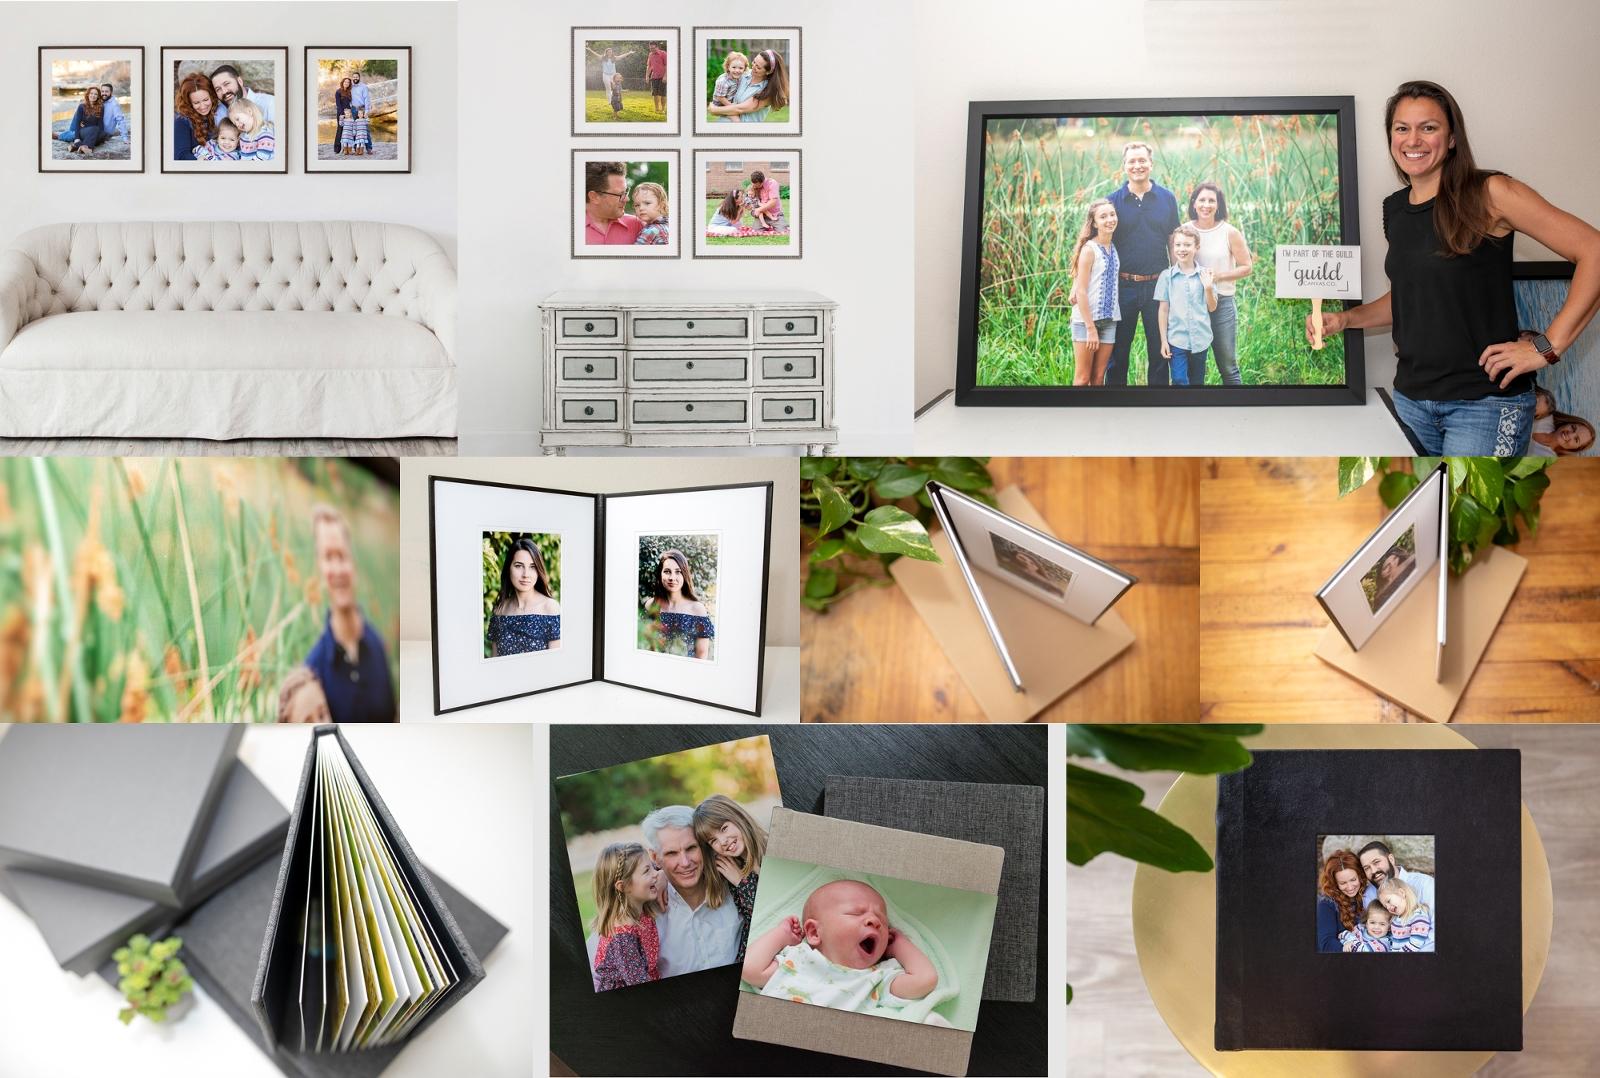 Austin Family Photographers Austin Photographers framed portraits albums image folio canvas art